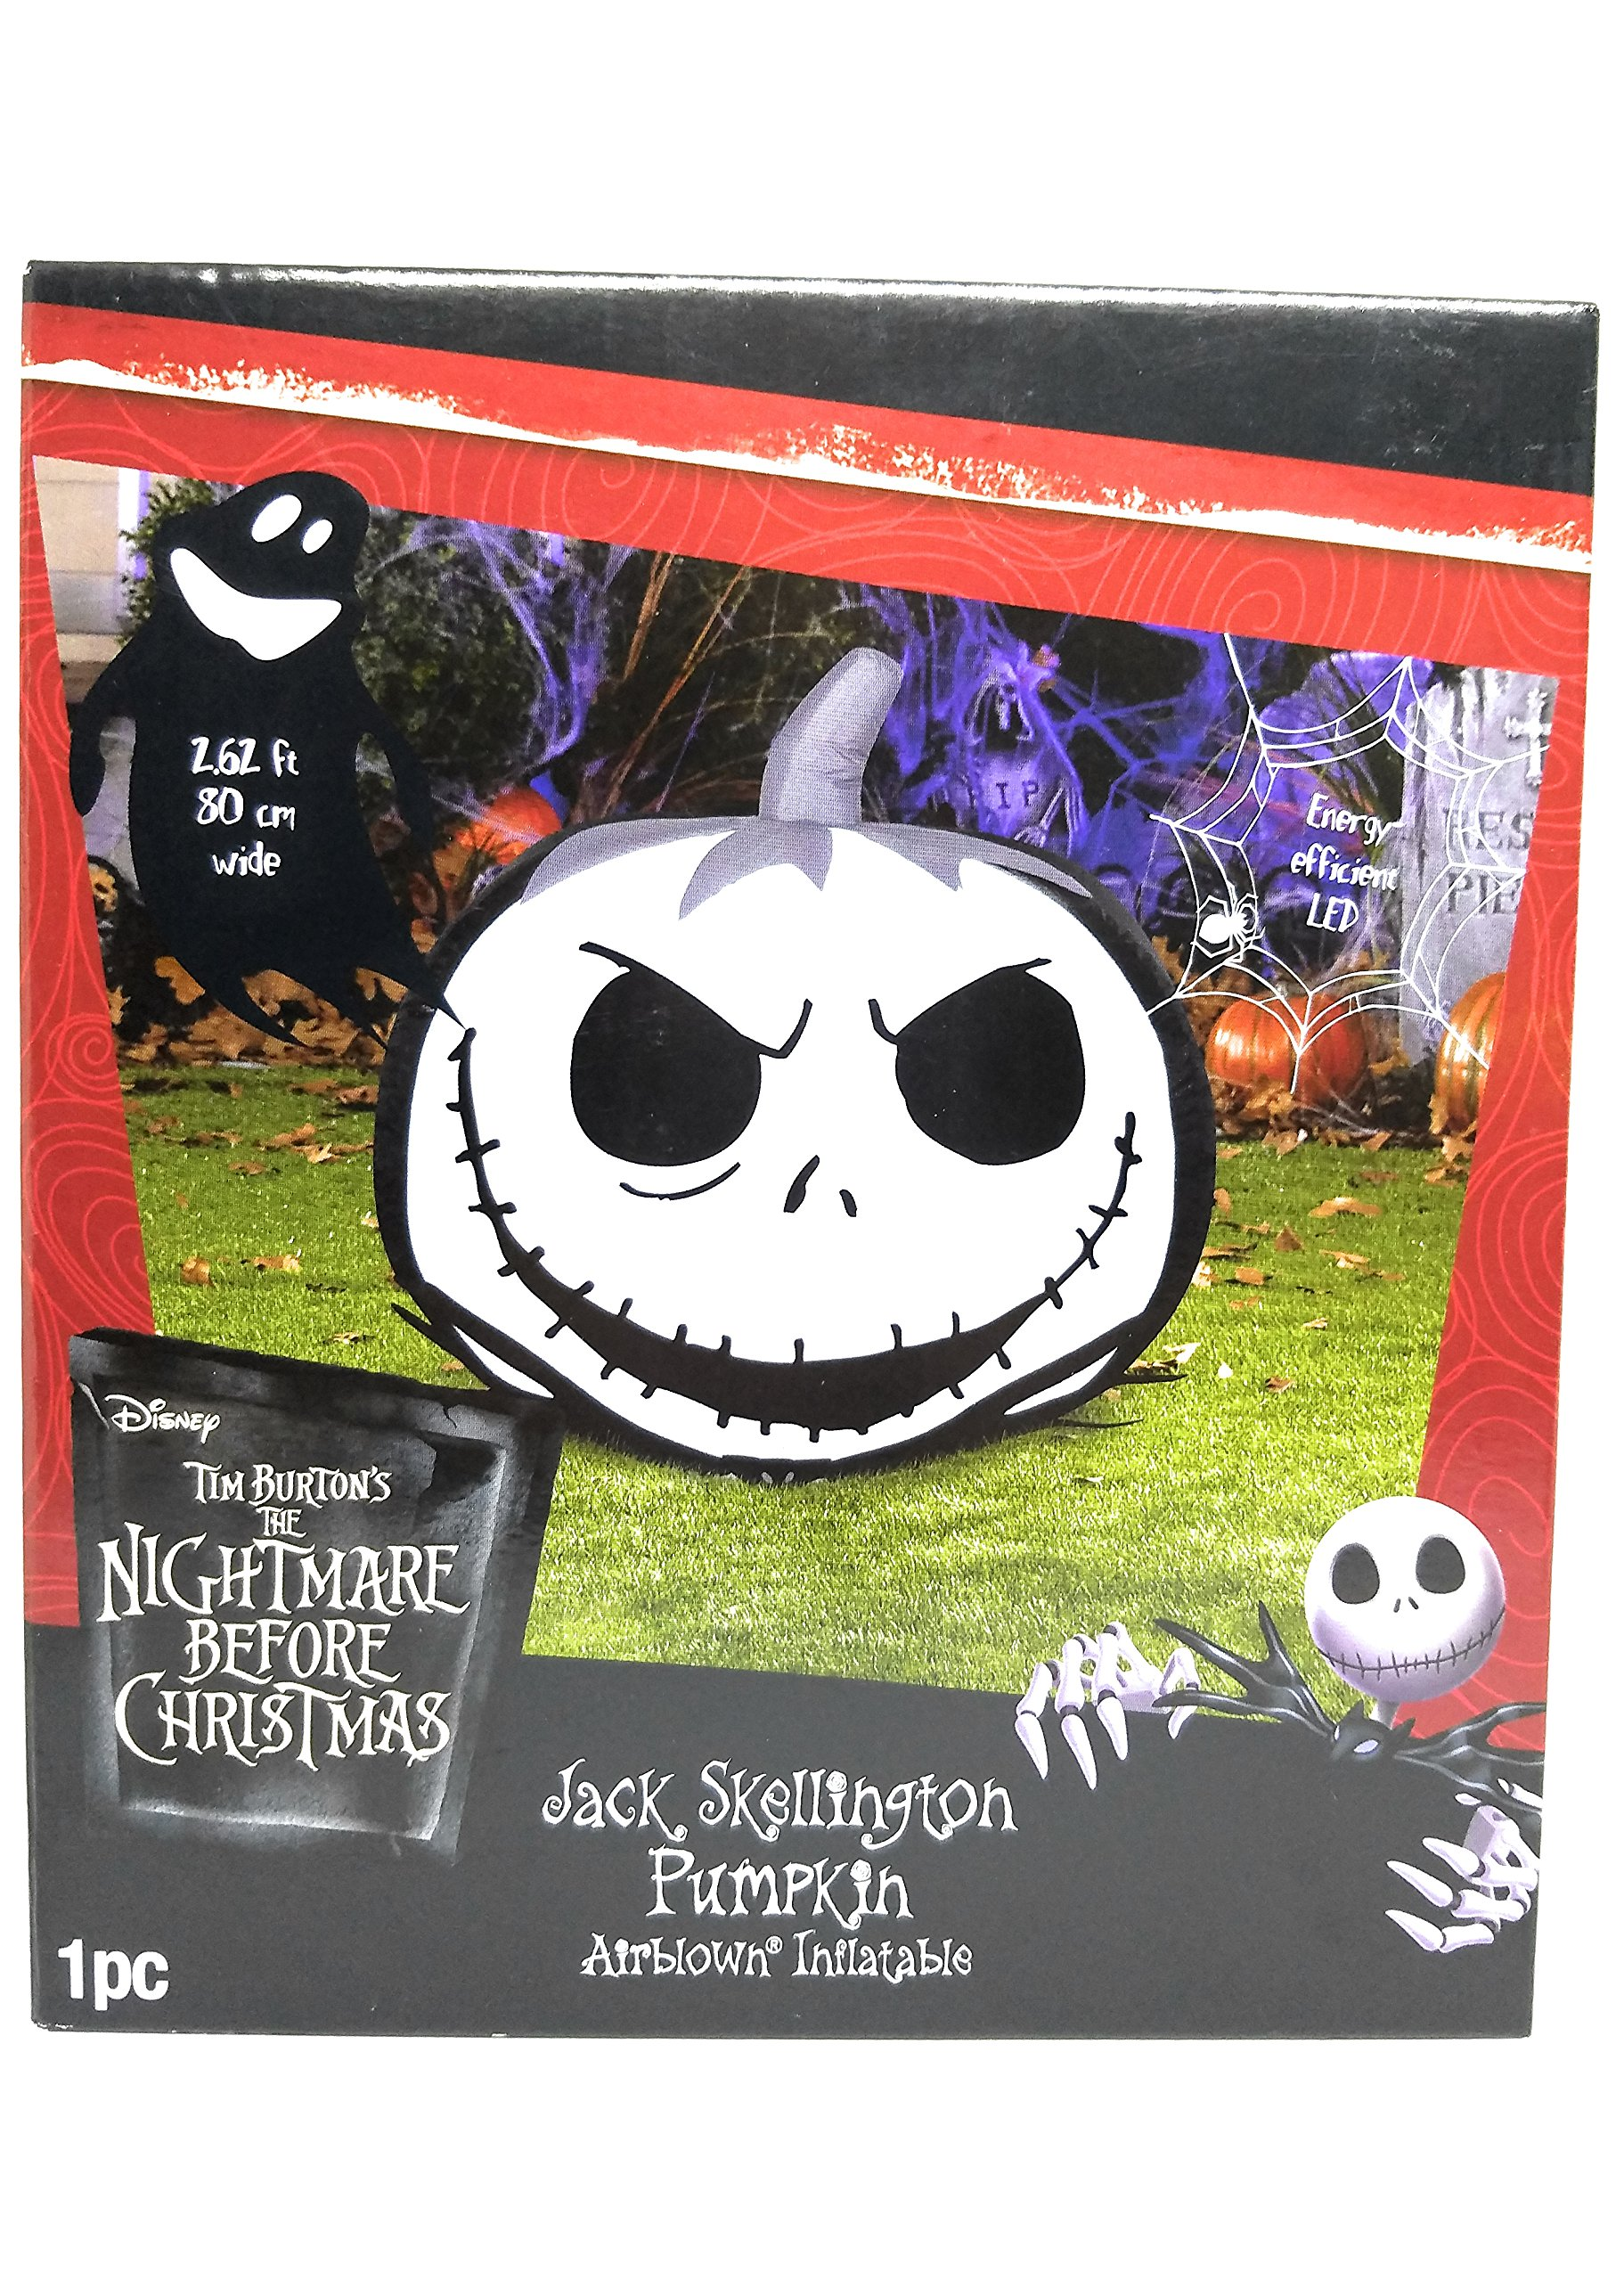 Jack Skellington Pumpkin Airblown Inflatable